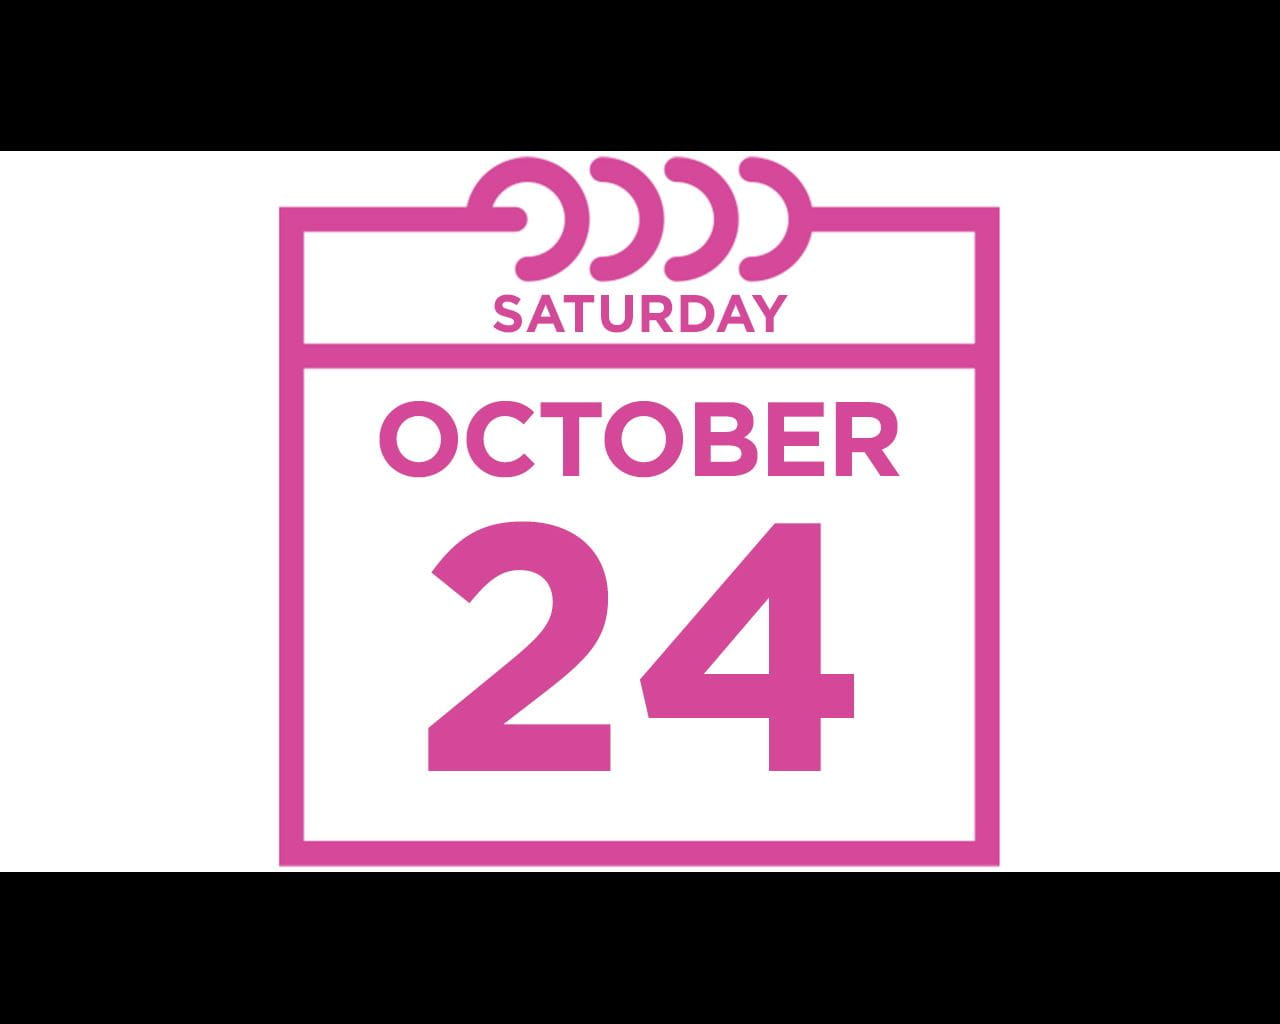 saturday october 24